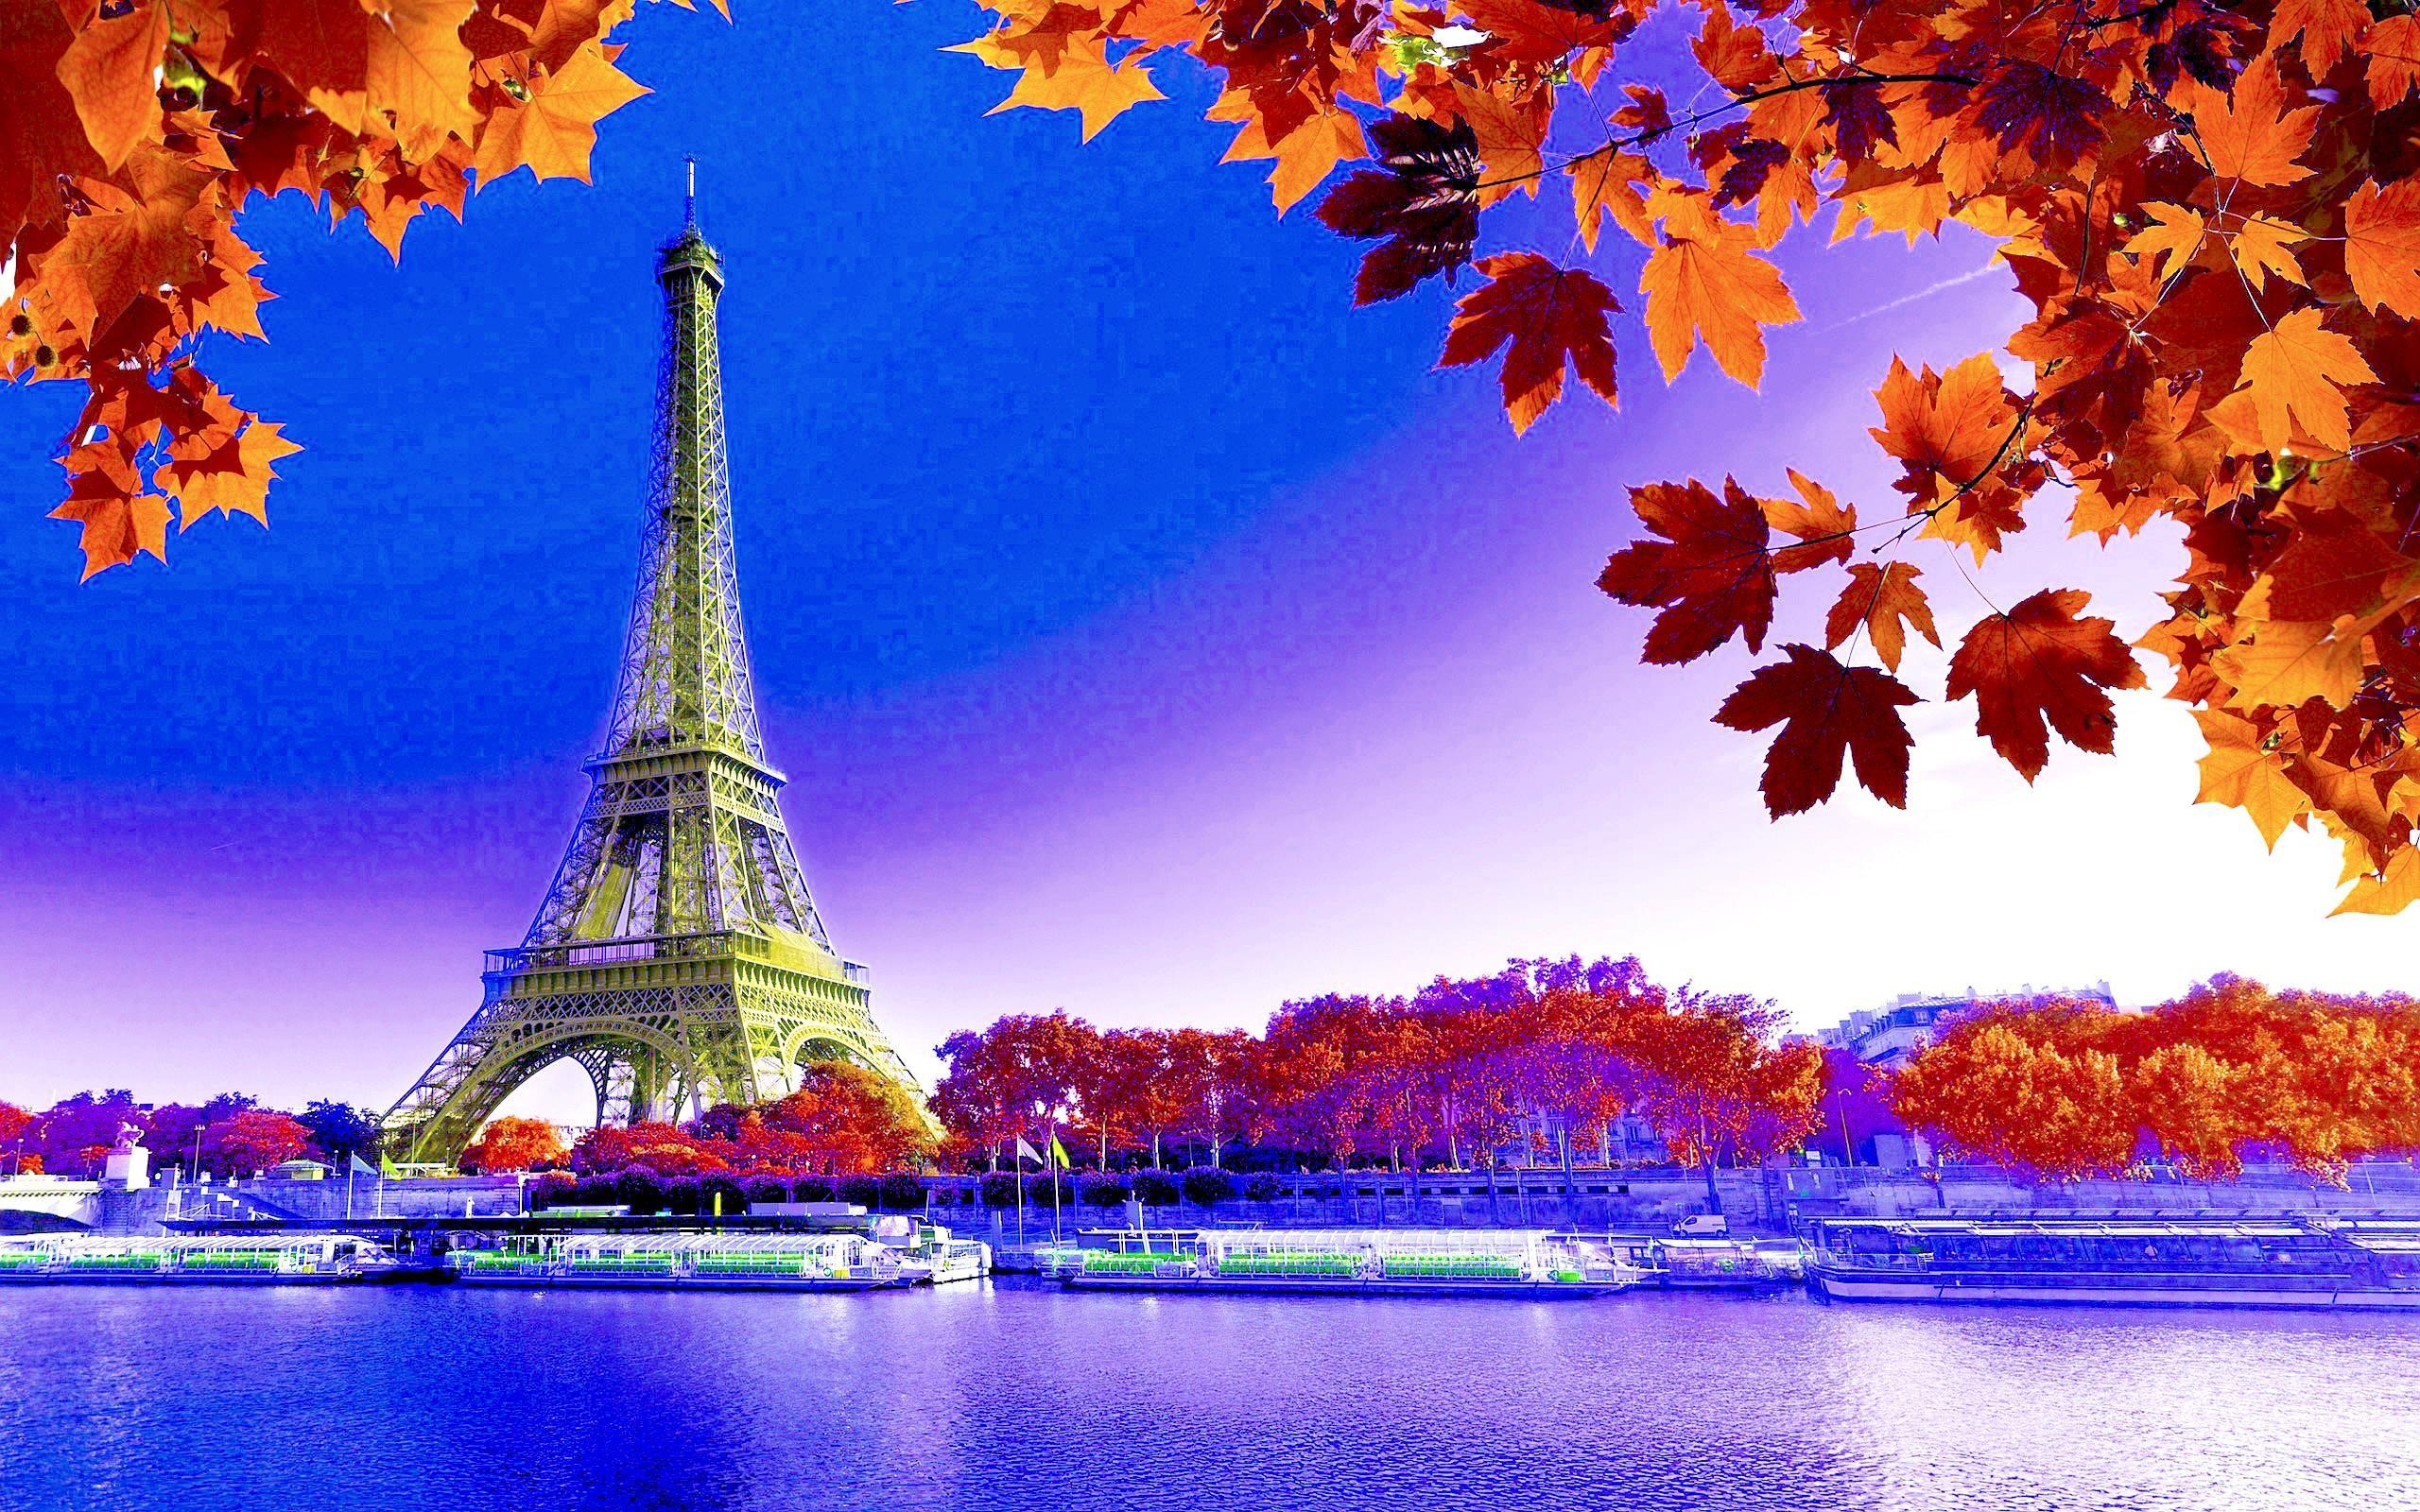 Eiffel tower background 63 images - Paris tower live wallpaper ...